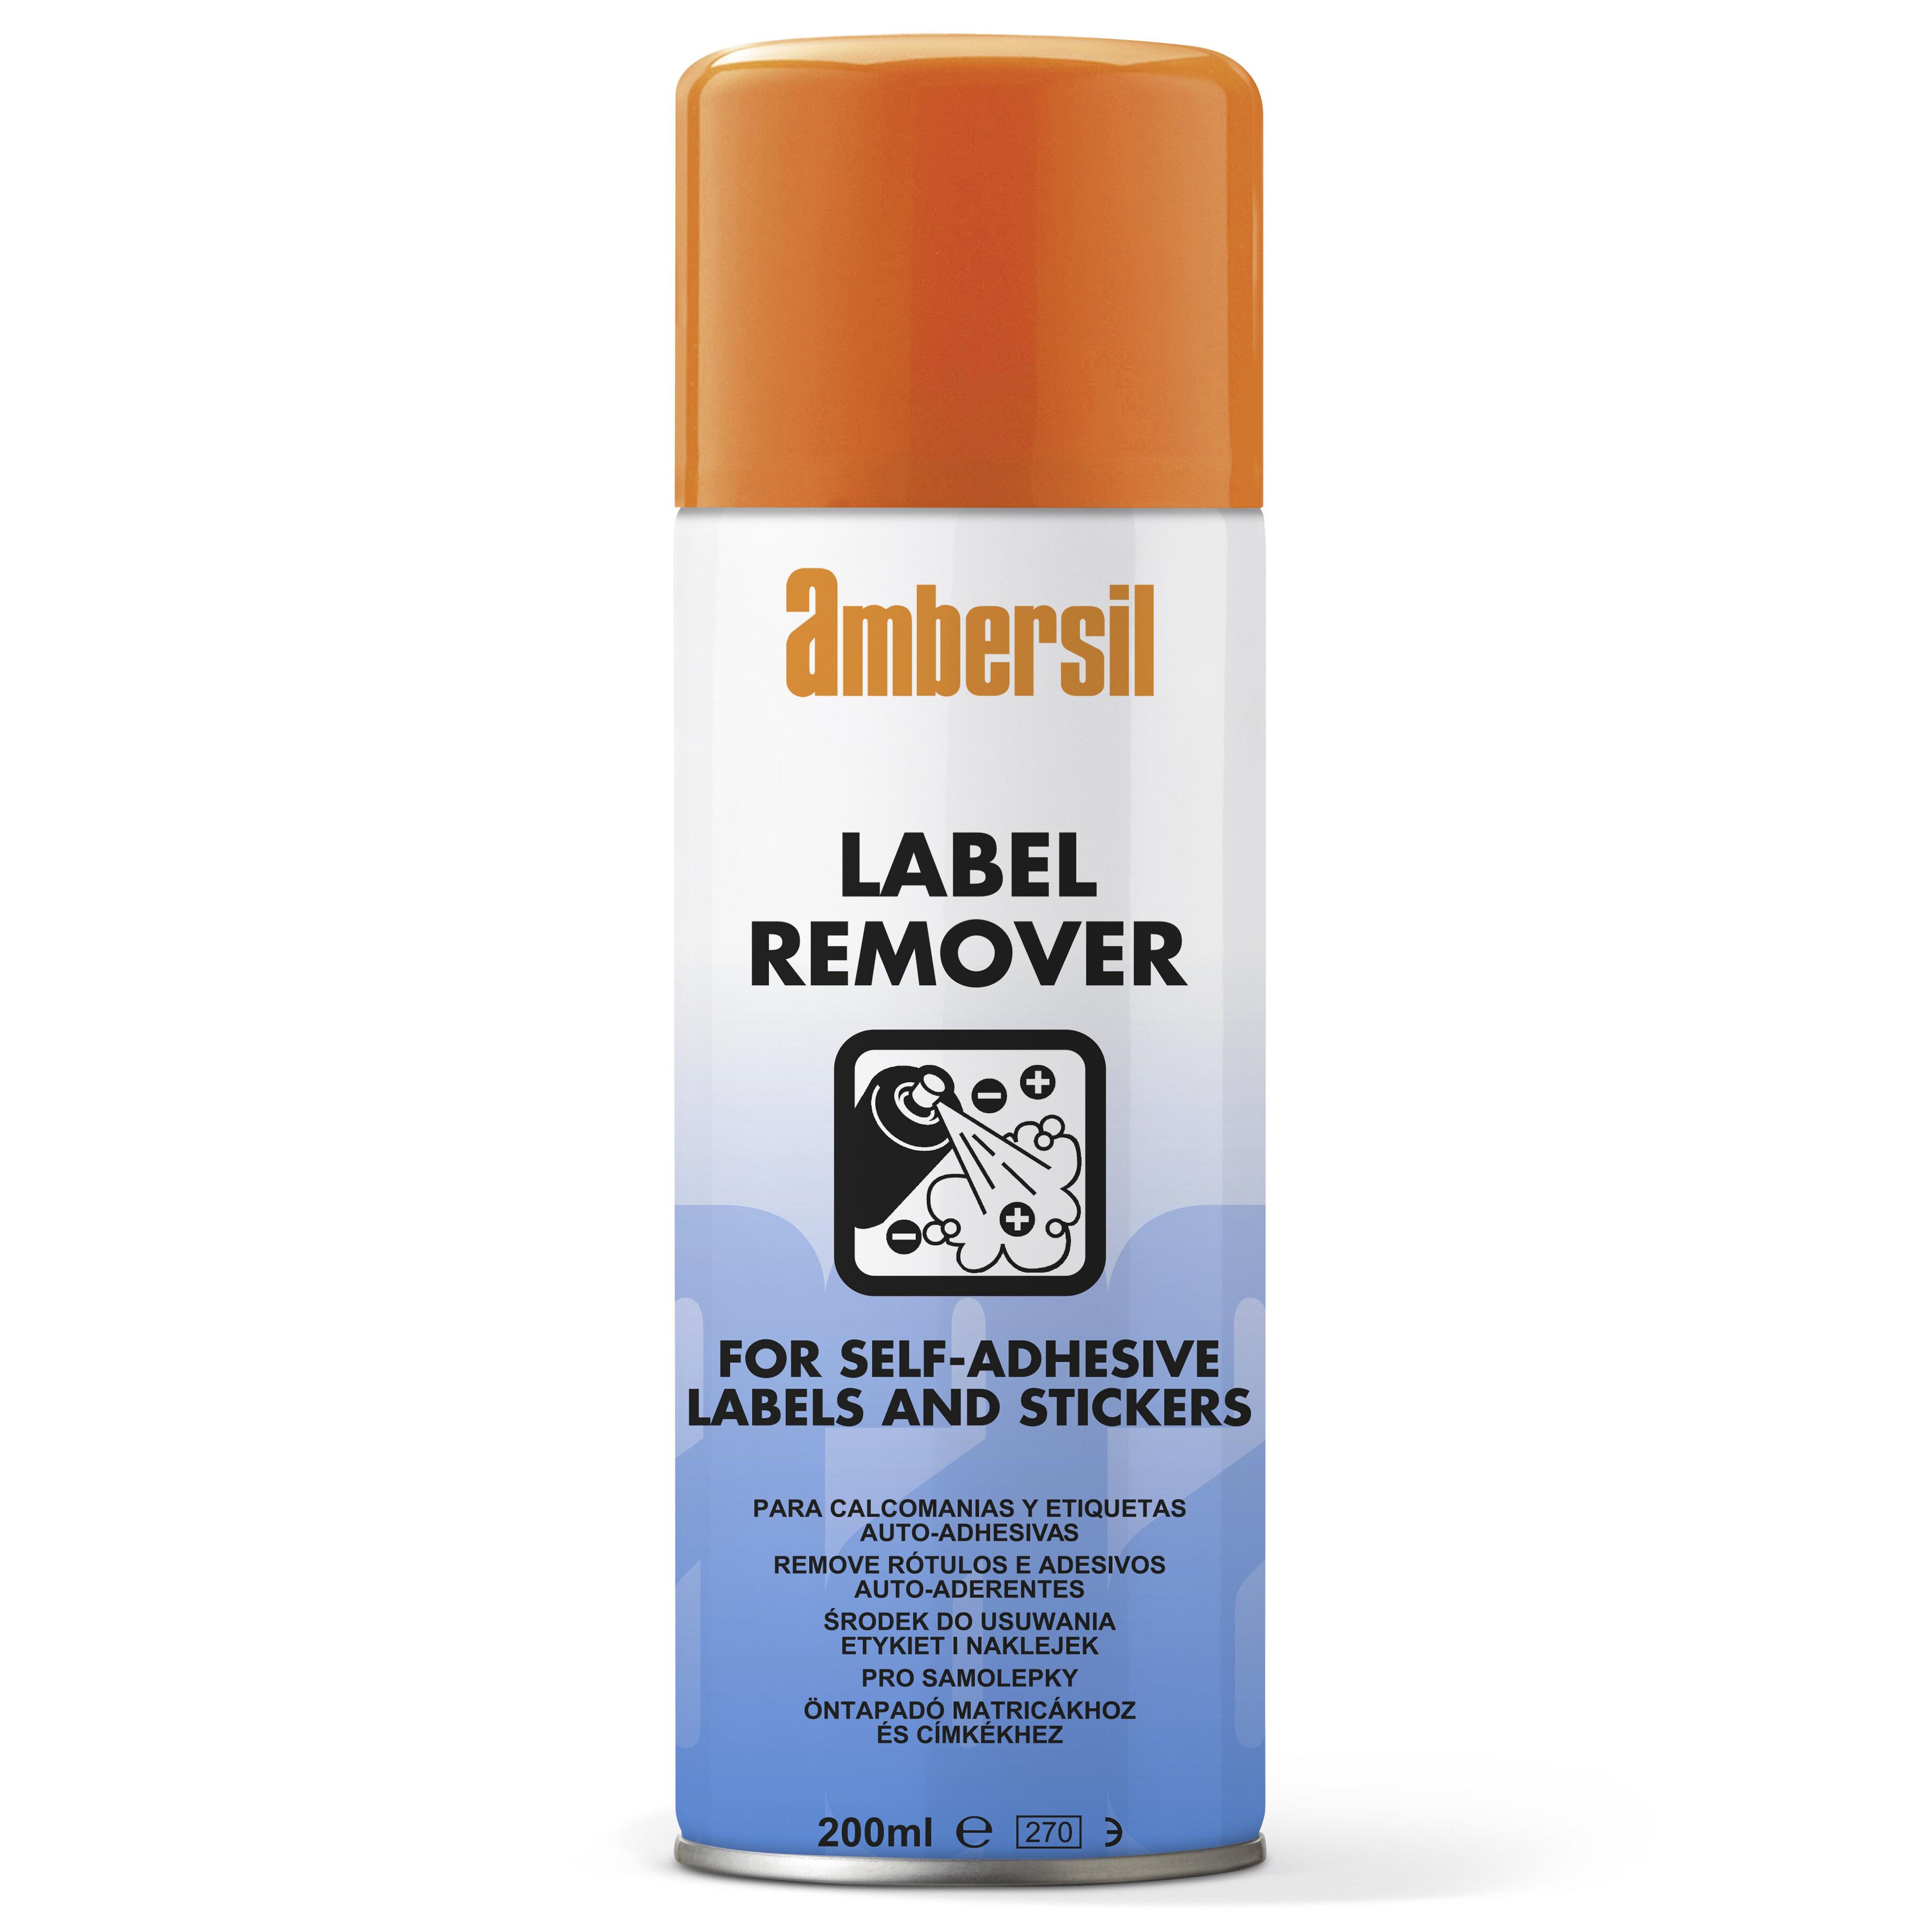 Ambersil 200 ml Aerosol Label Remover